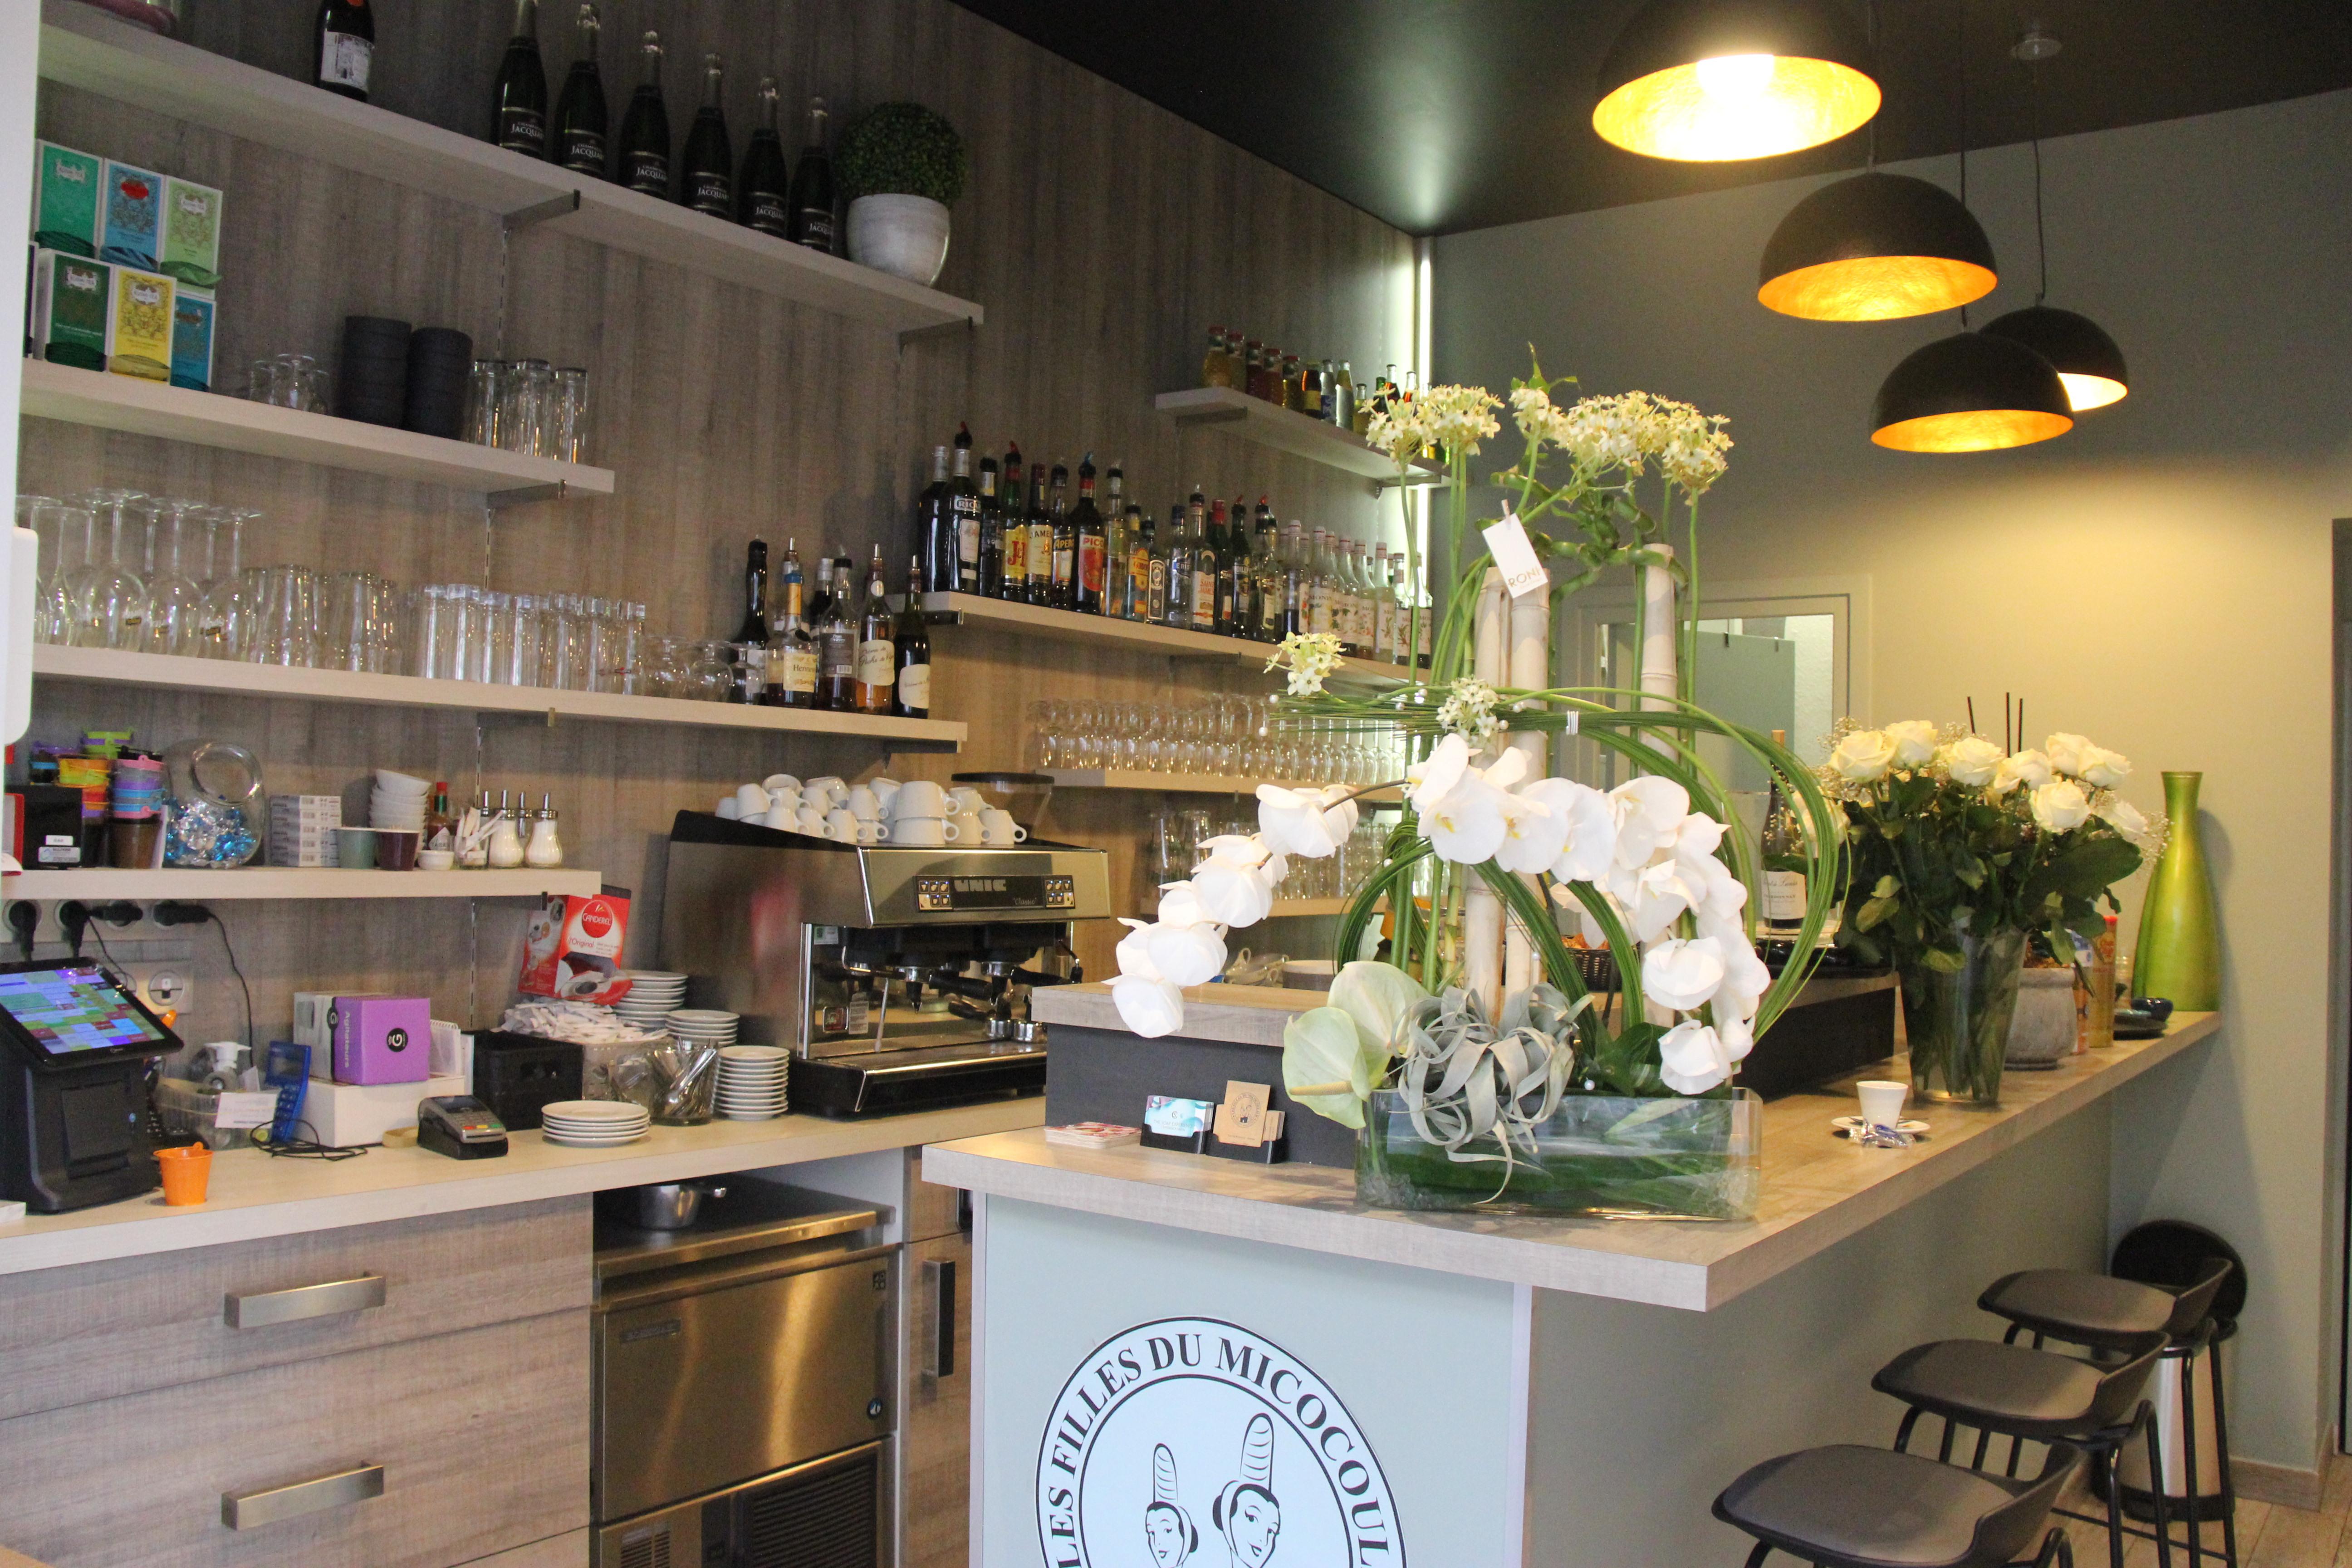 fauroux-architecte-valbonne-paca-antibes-nice-renovation-restaurant5